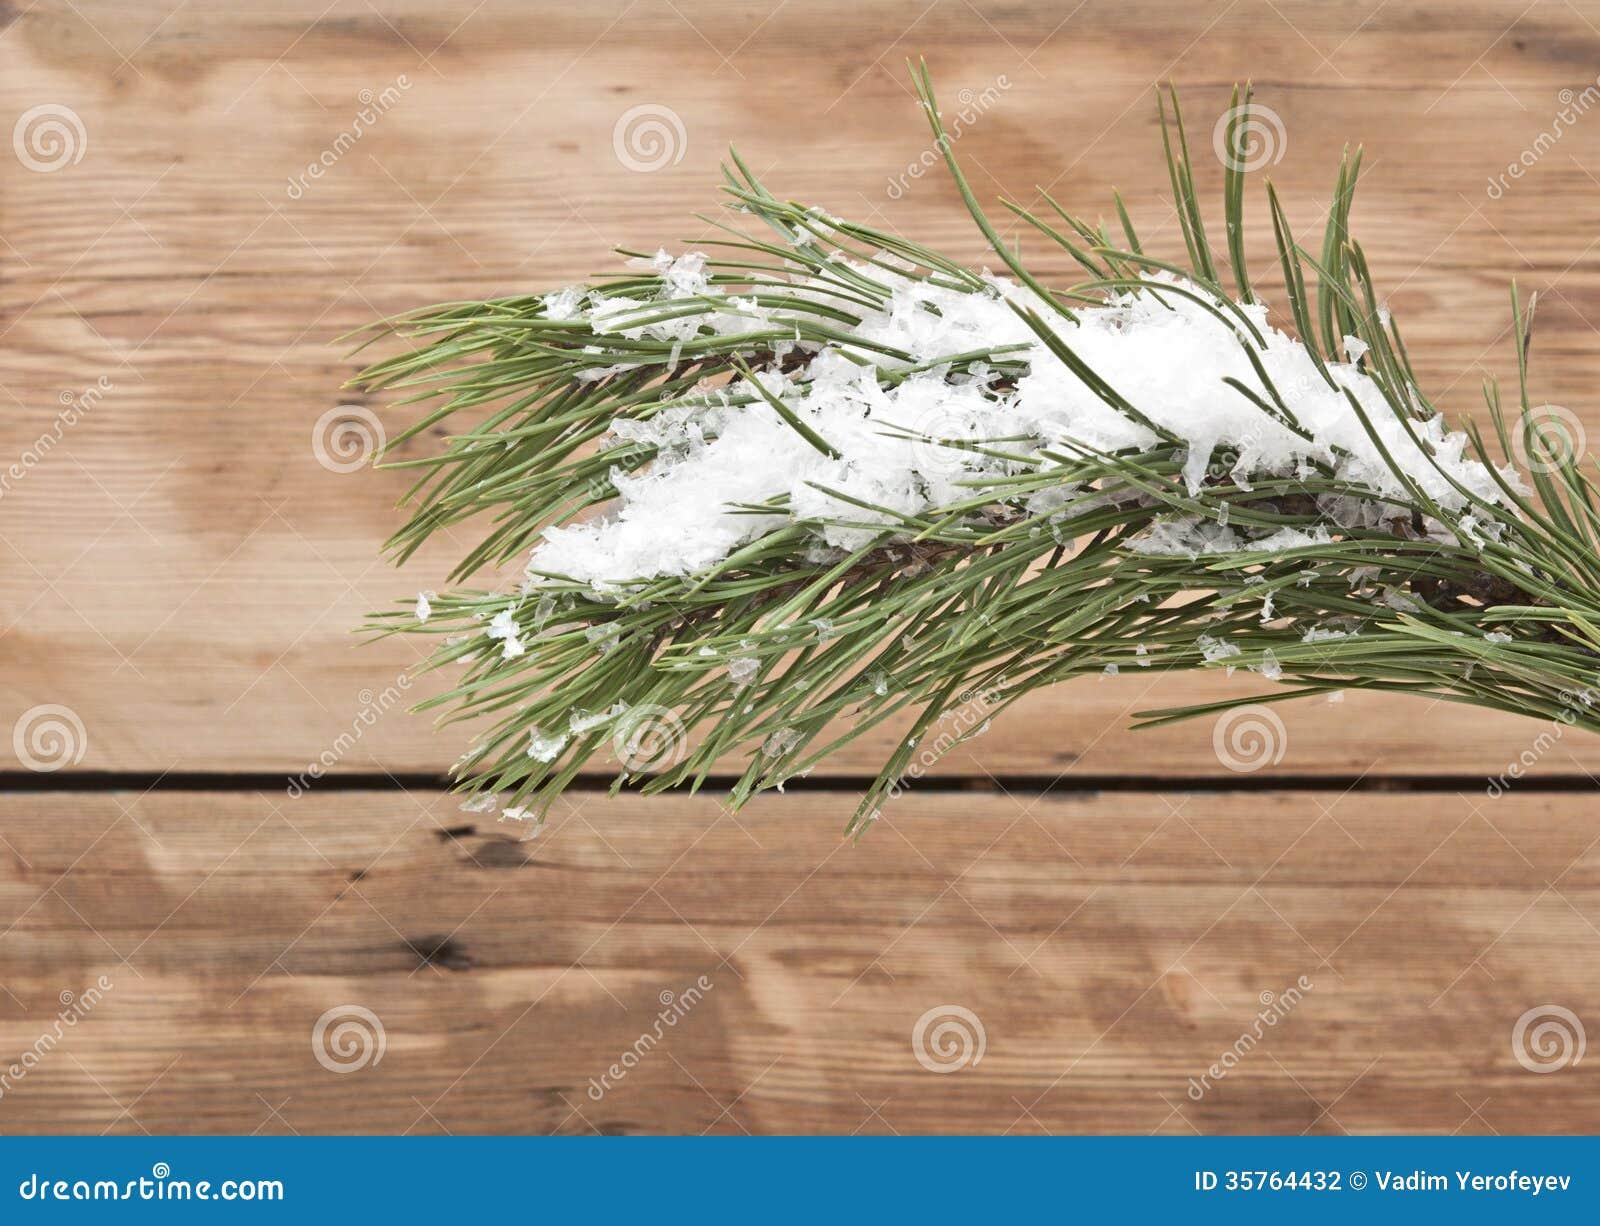 Jardisart - Les plantes disponibles - Arbres feuillage persistant